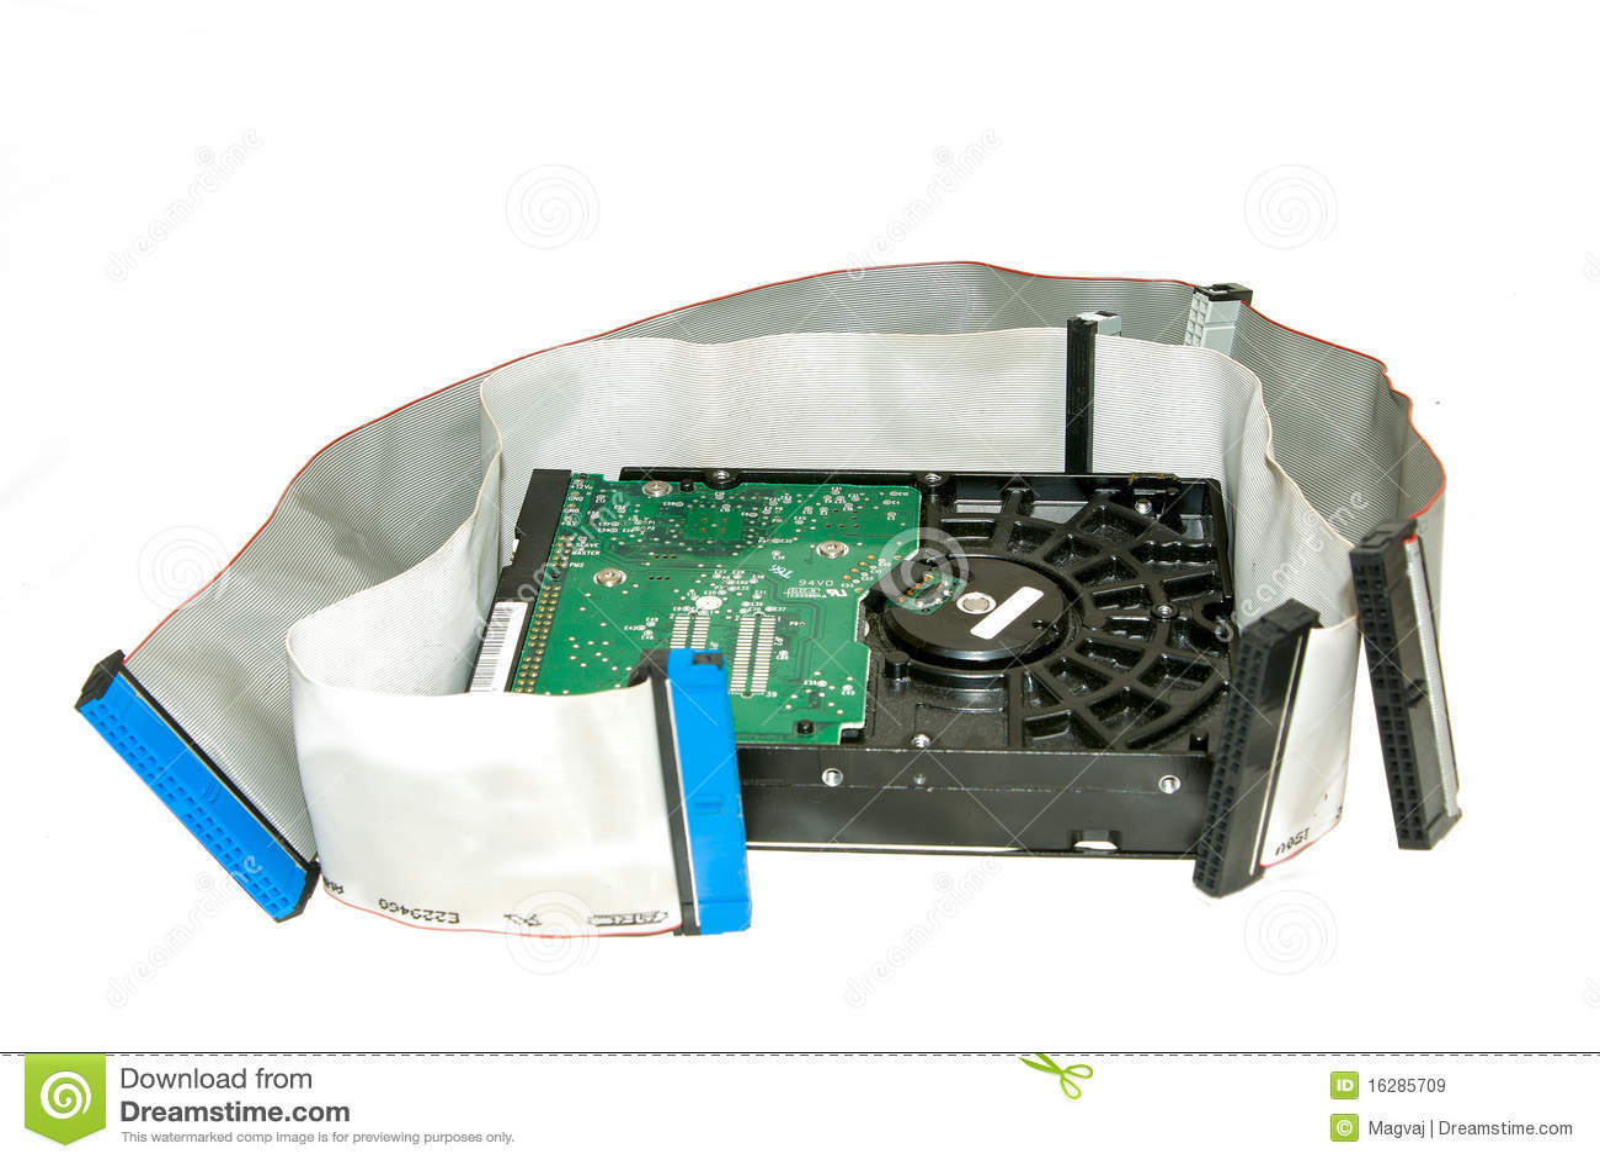 Download Computer hardware stock image. Image of hardware, design - 16285709